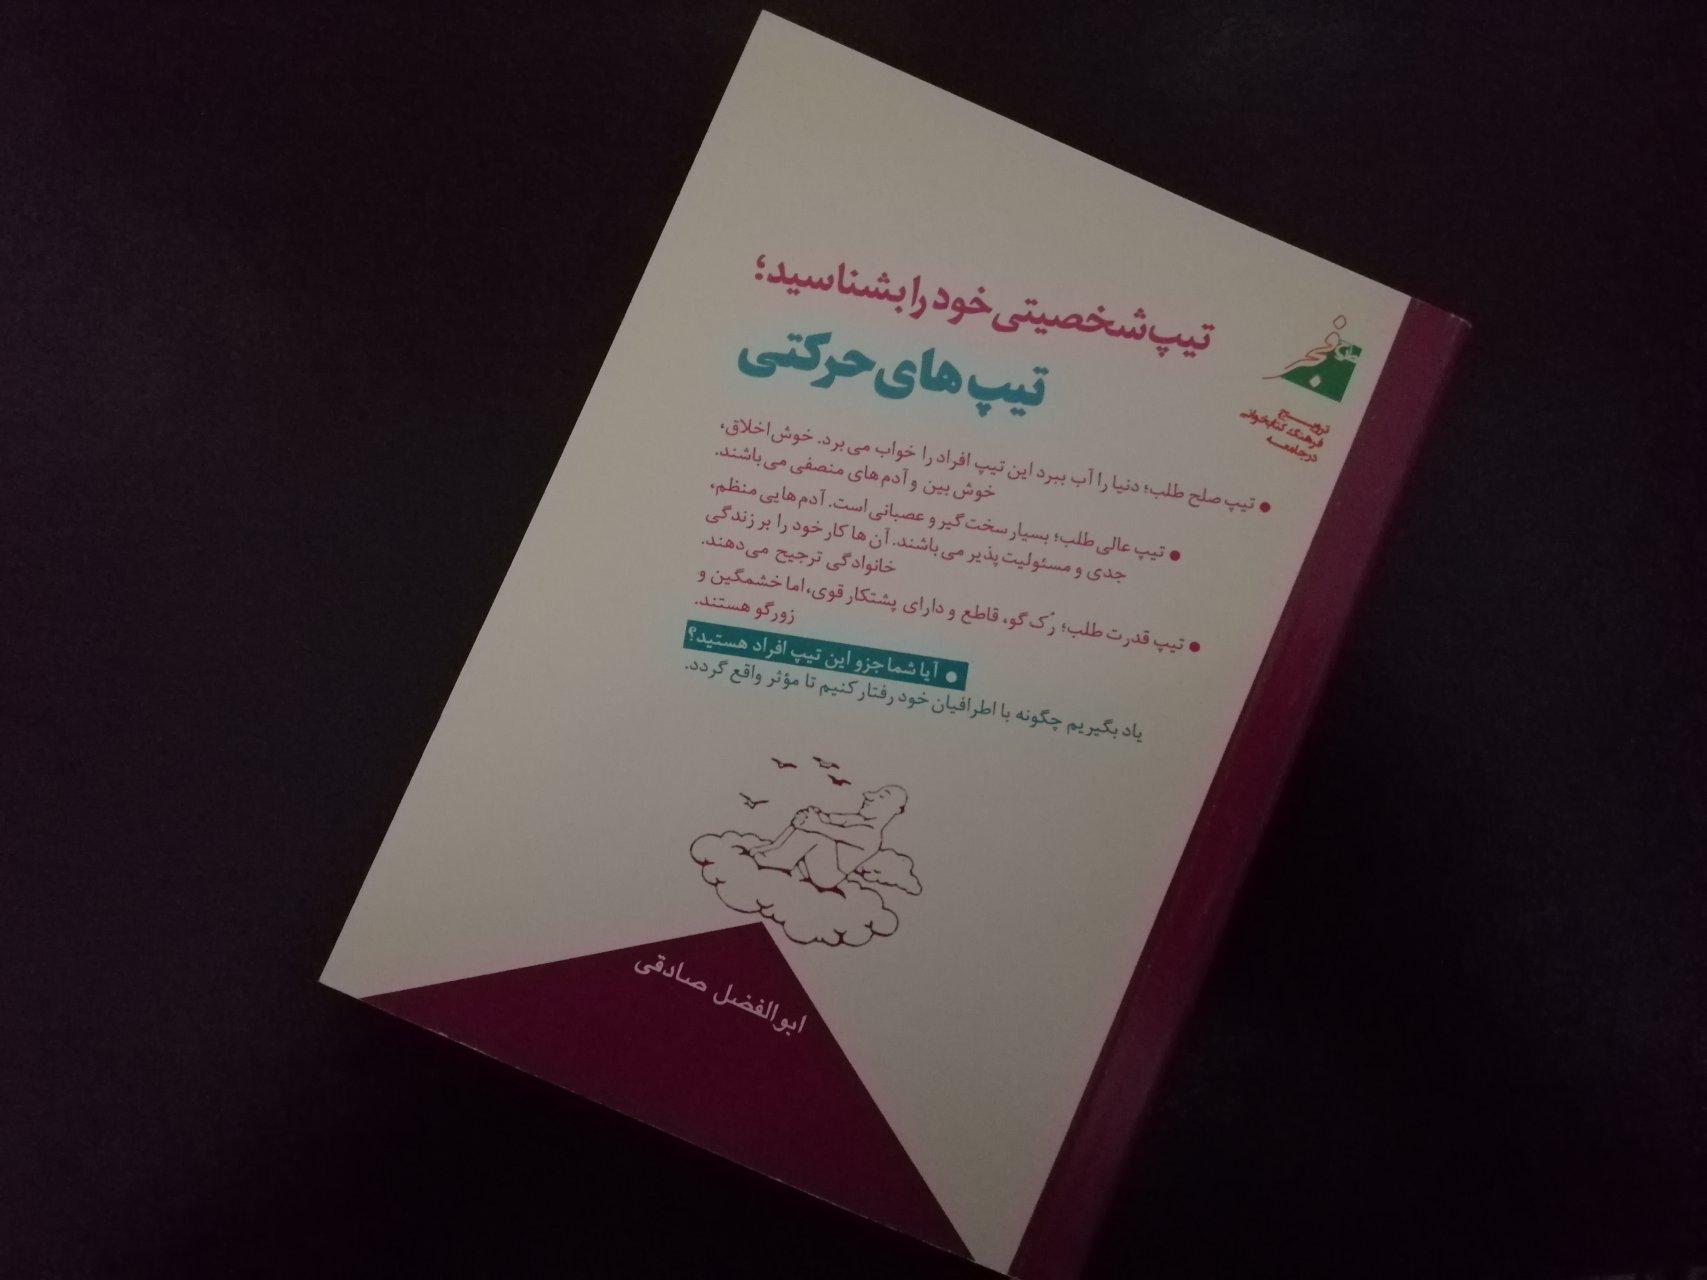 کتاب الکترونیکی تیپهای حرکتی اثر ابوالفضل صادقی